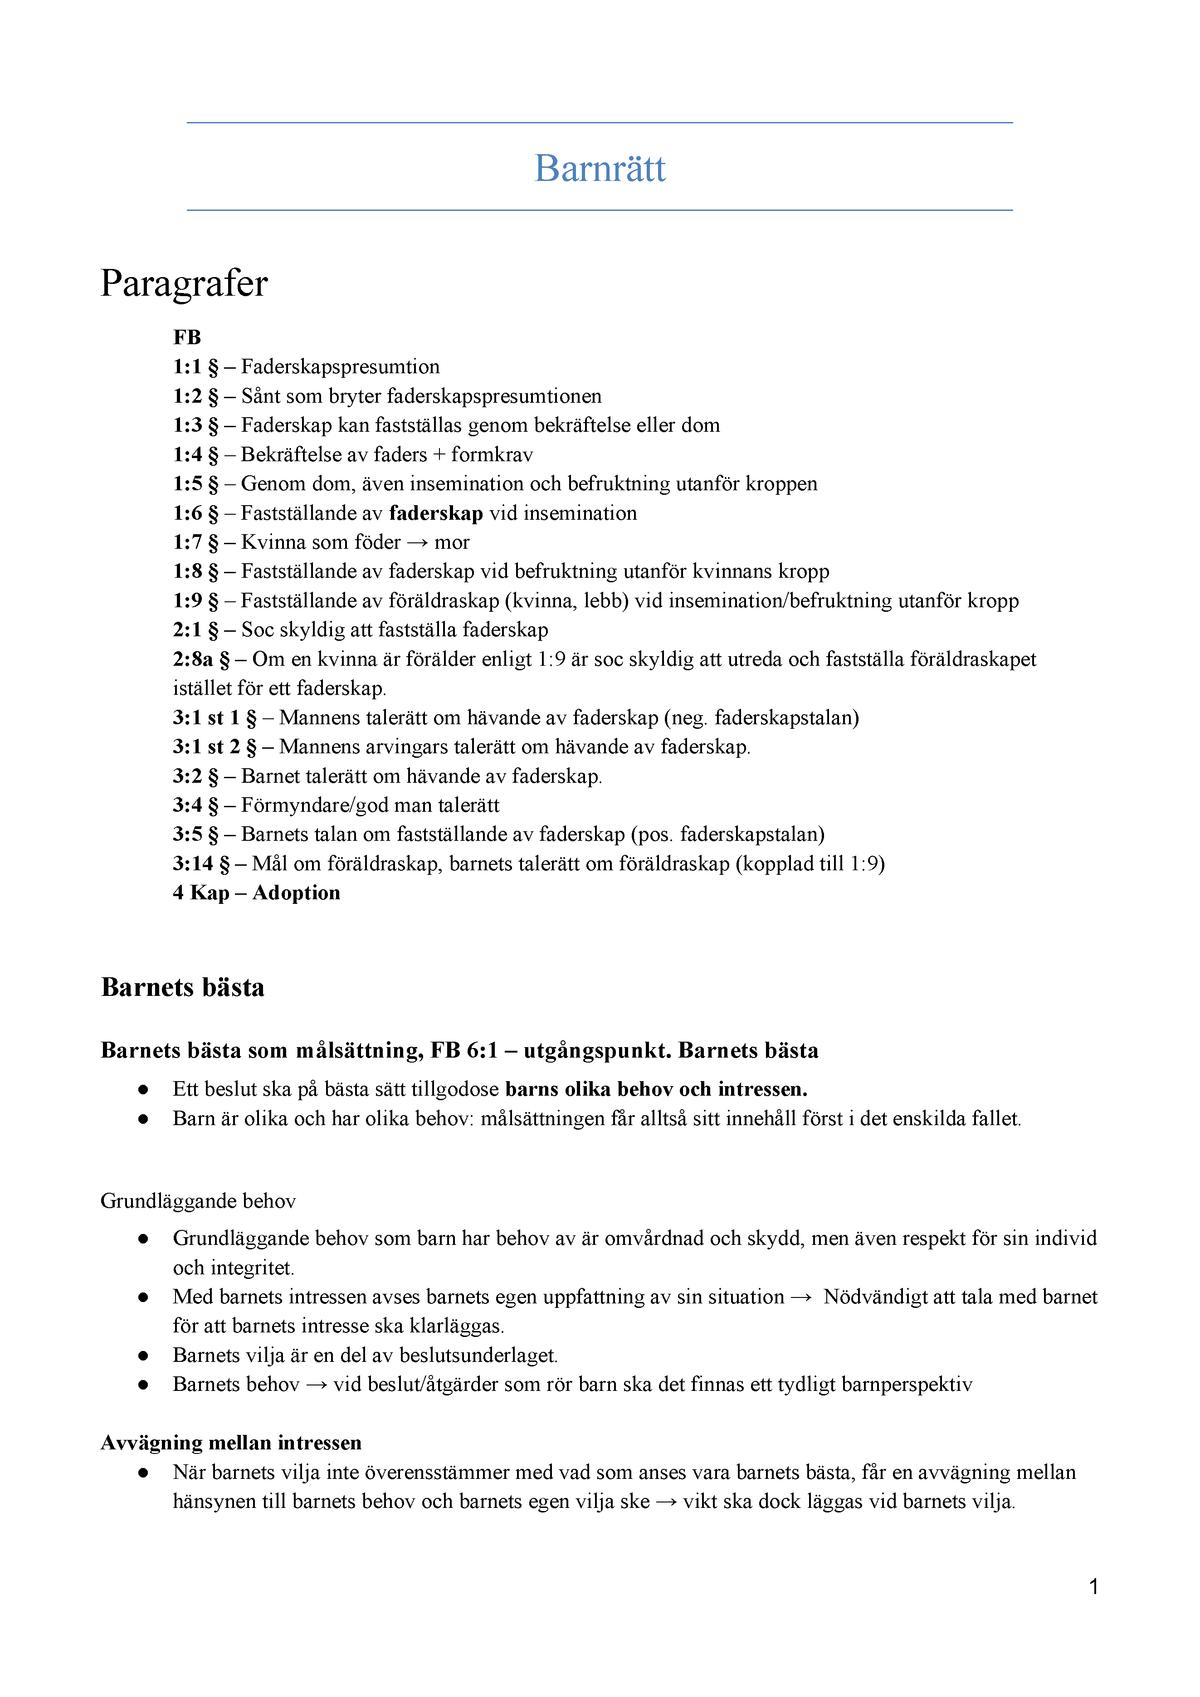 f64f2257 Tentapärm Barnrätt - Terminskurs 3: Civilrätt 2JJ303 - StuDocu